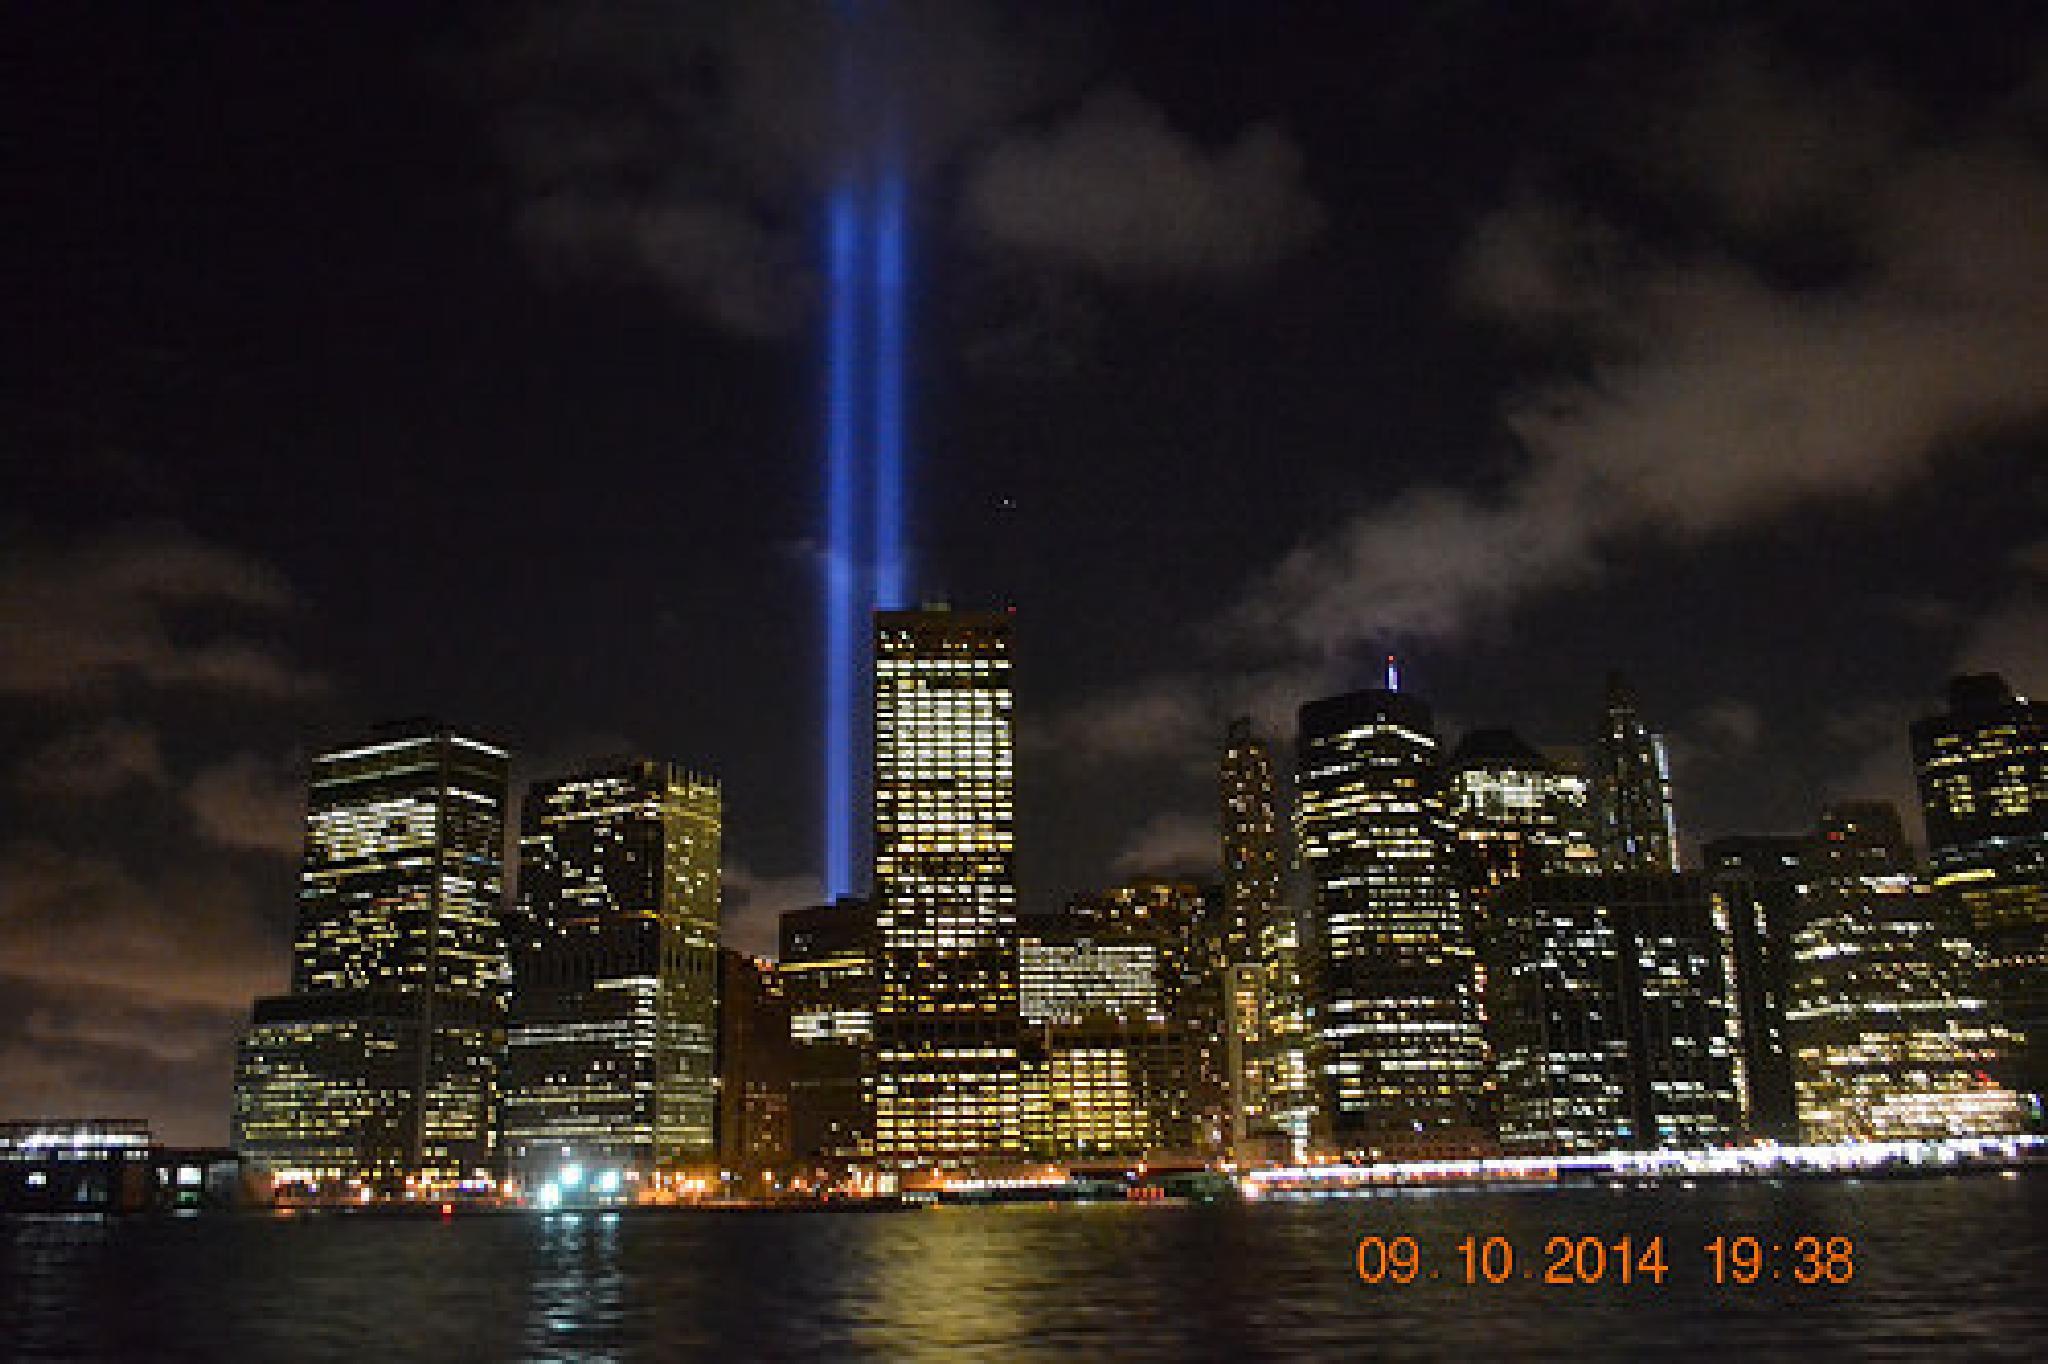 Freedom lights NYC by kelli.oconnormays